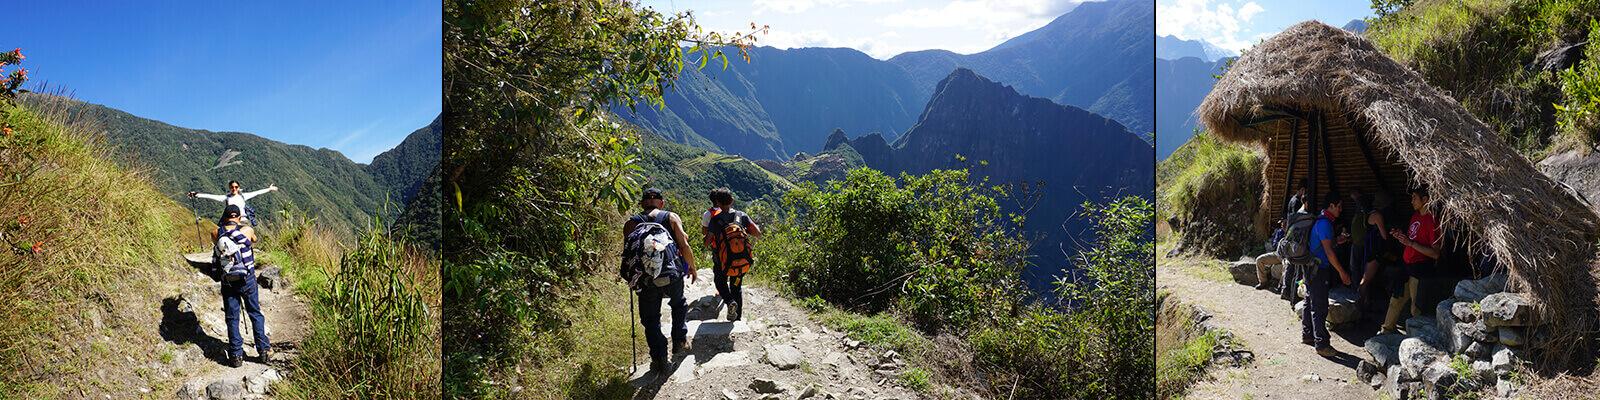 camino-inca-machu-picchu-andes-tours